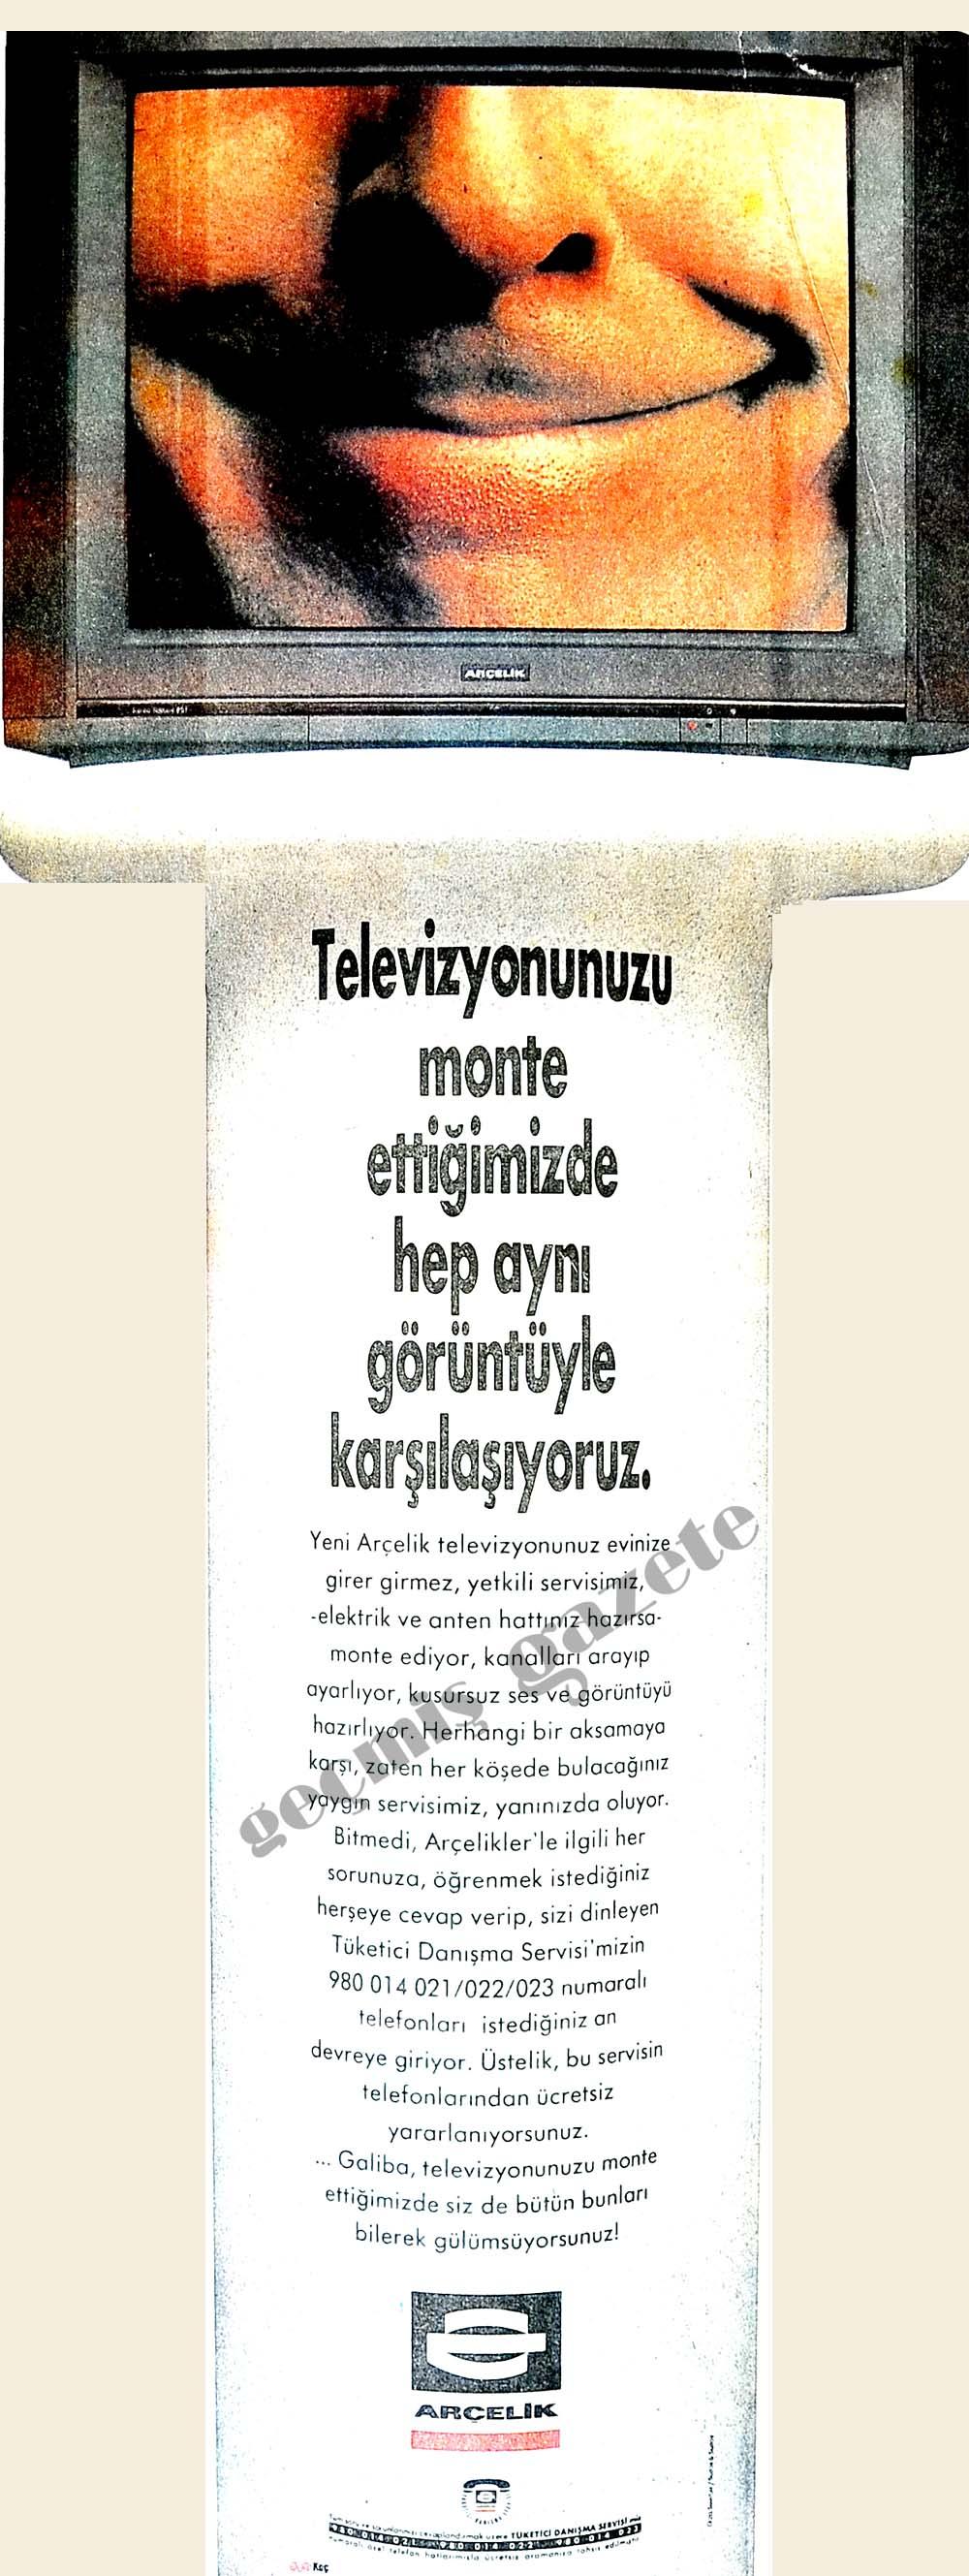 Arçelik Televizyon